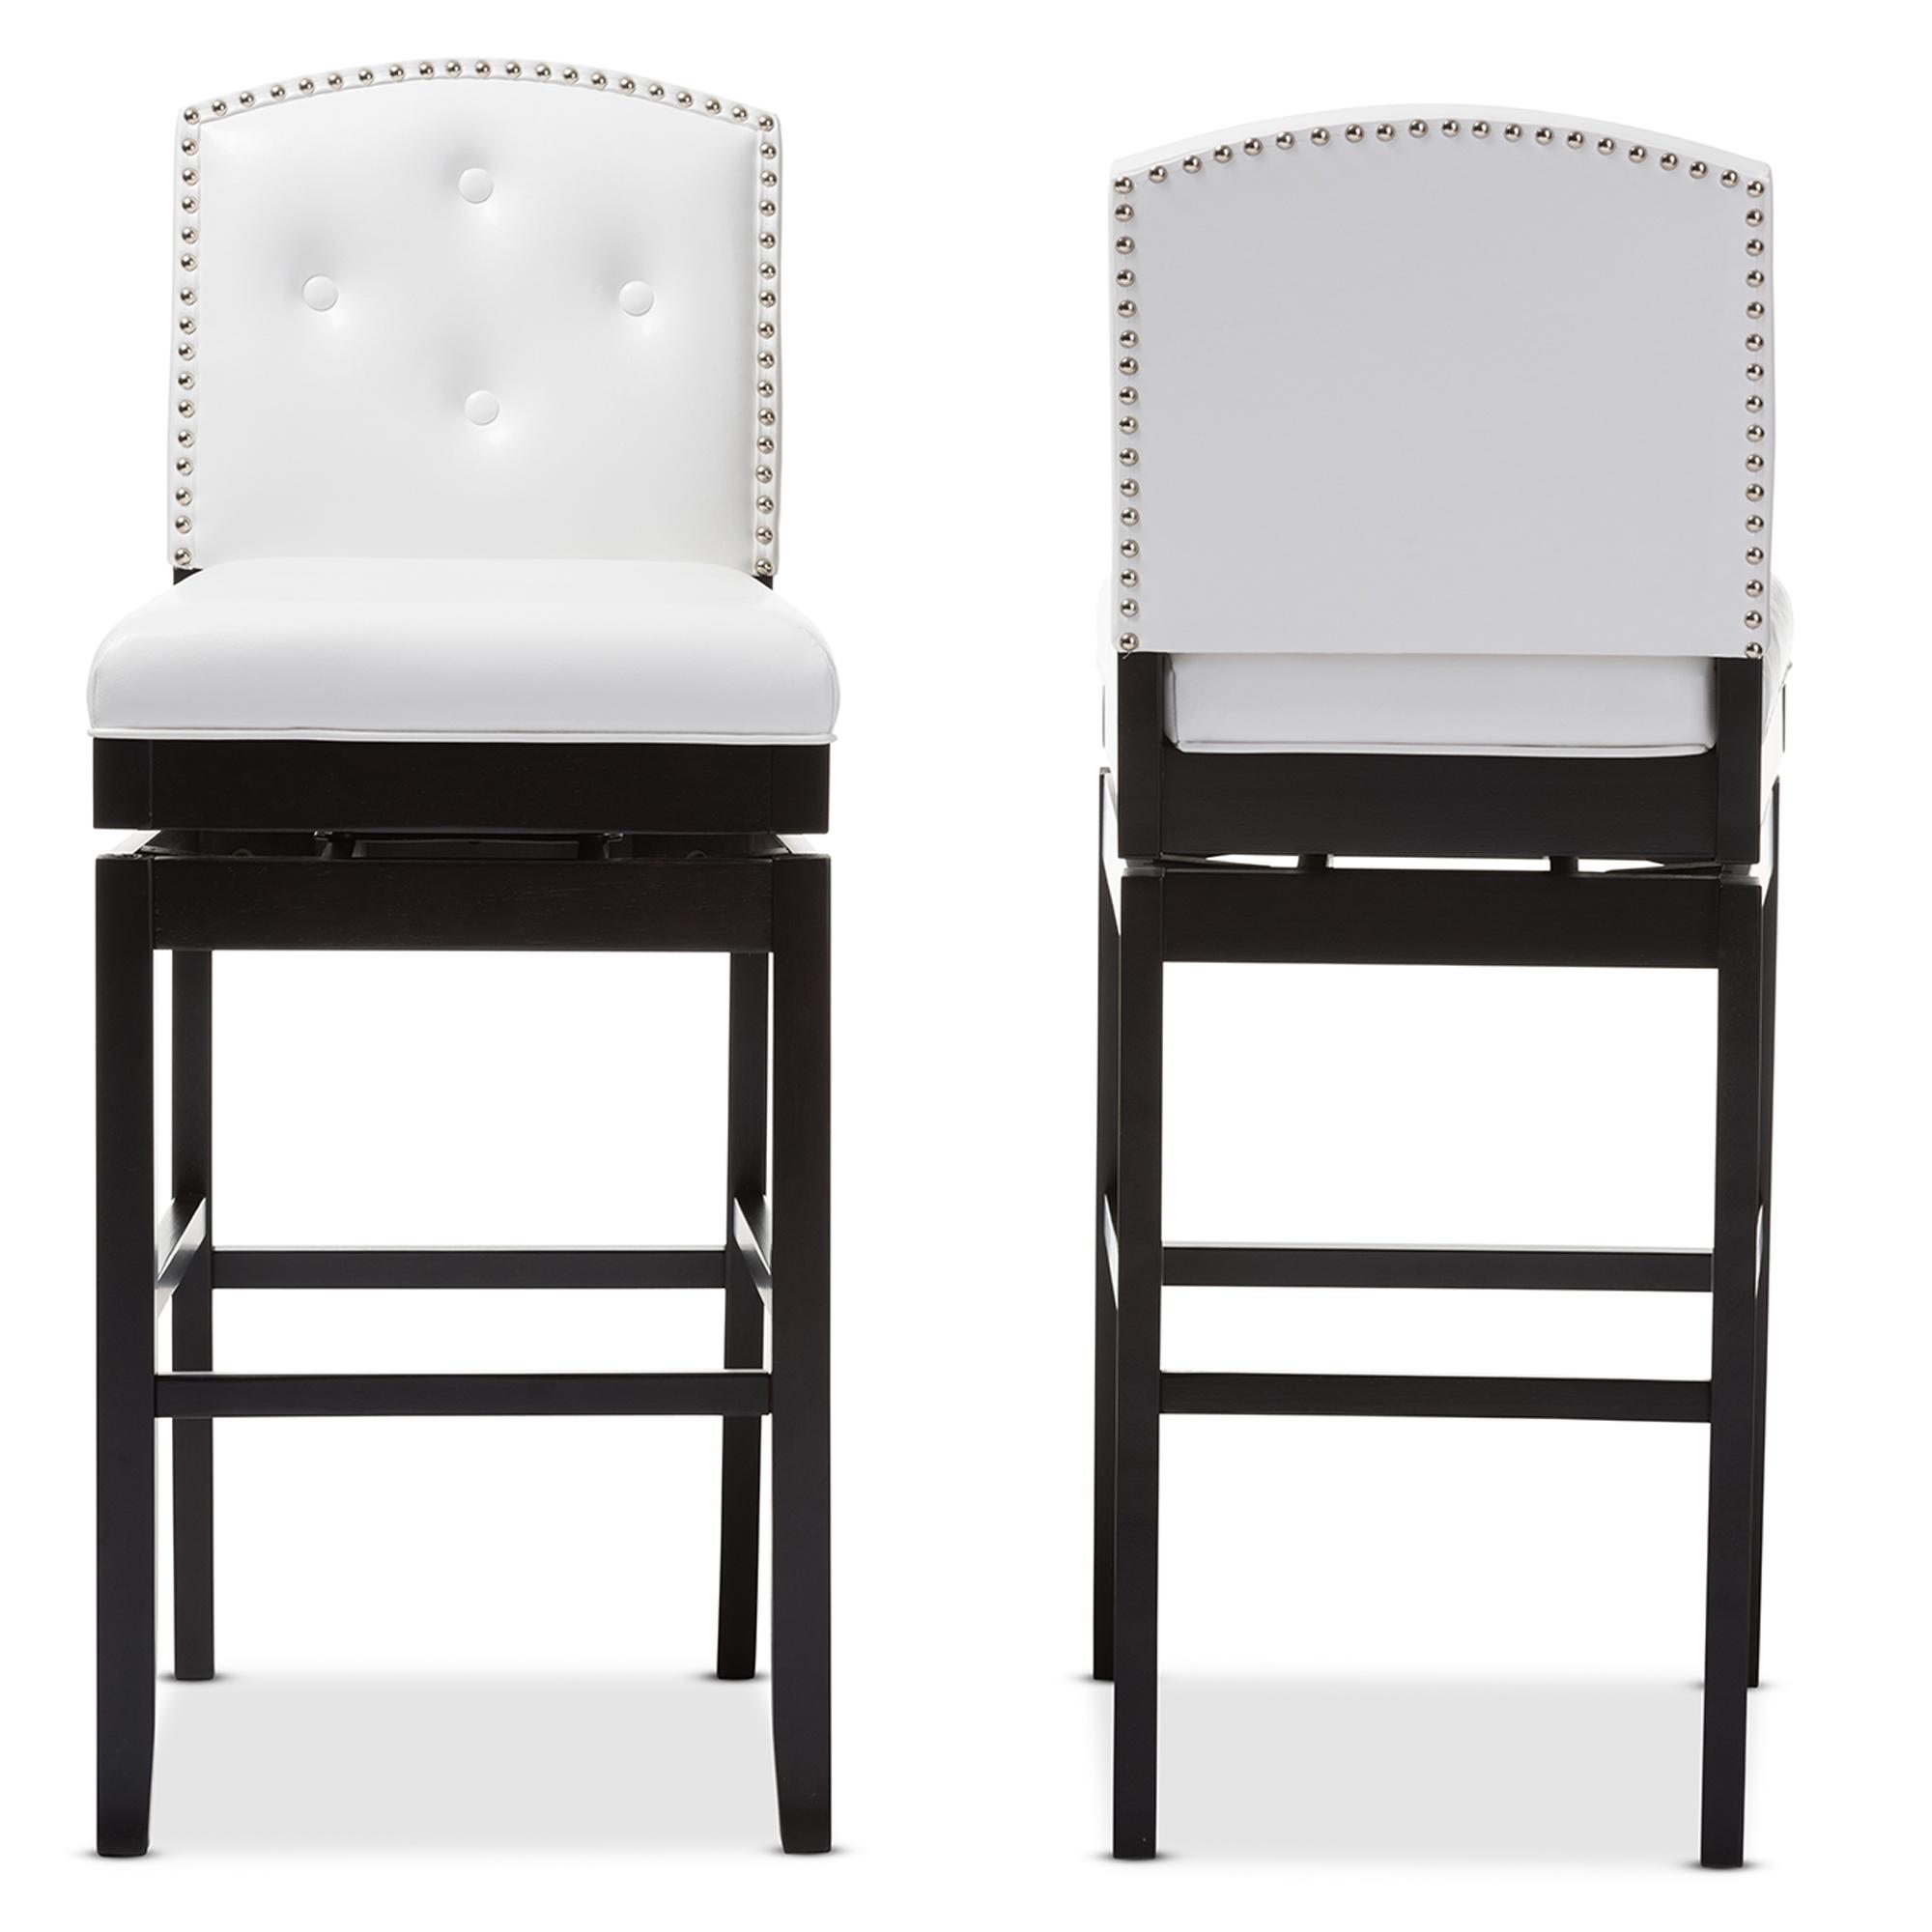 Fabulous White Leather Tufted Bar Stools Uwap Interior Chair Design Uwaporg